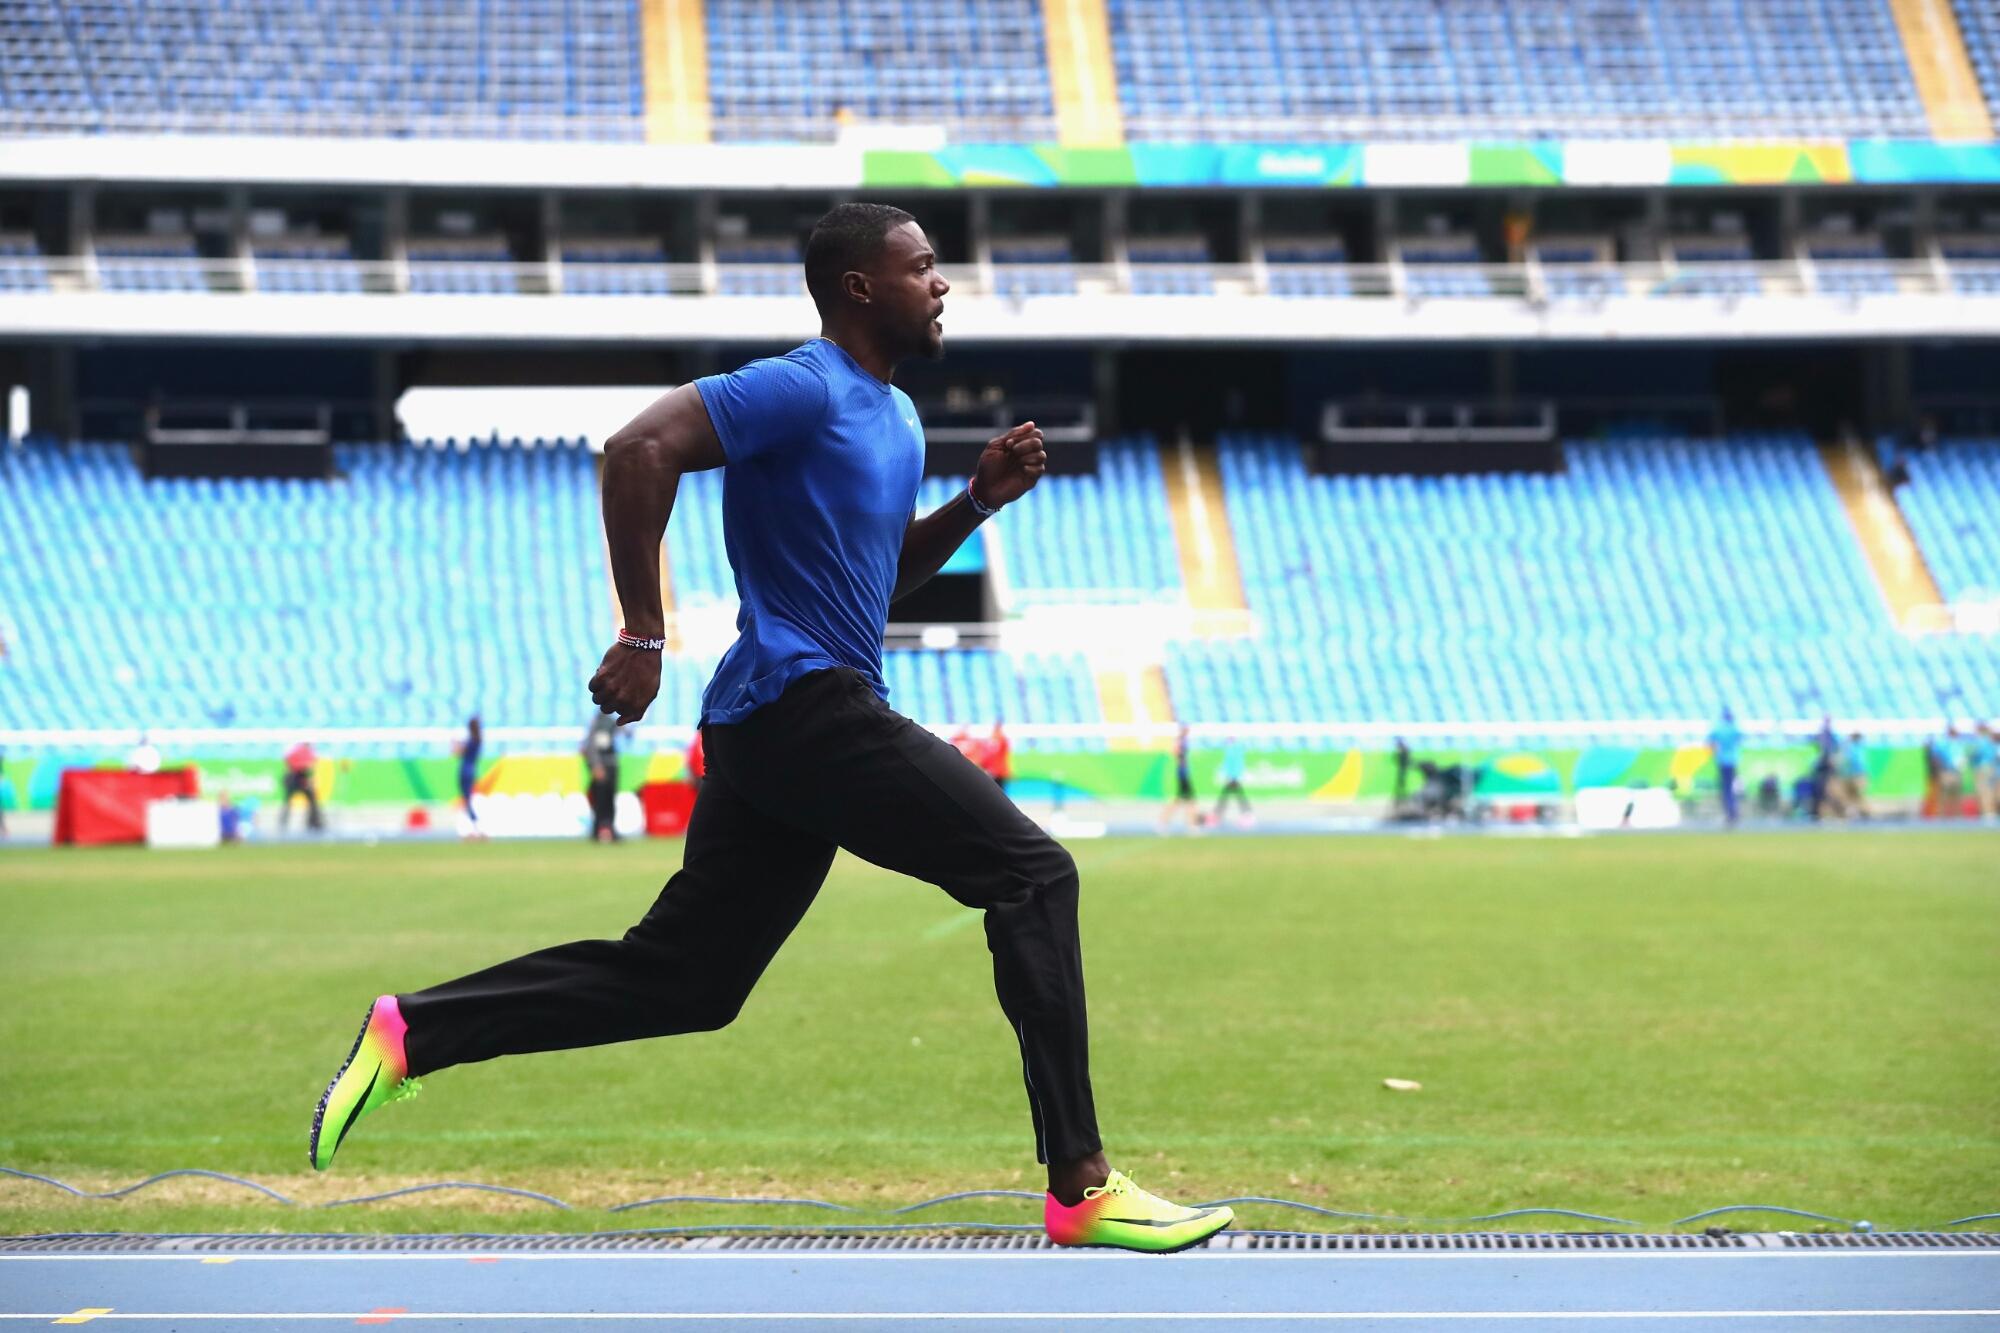 Justin Gatlin, Justin Gatlin running, Justin Gatlin career, Rio Olympics